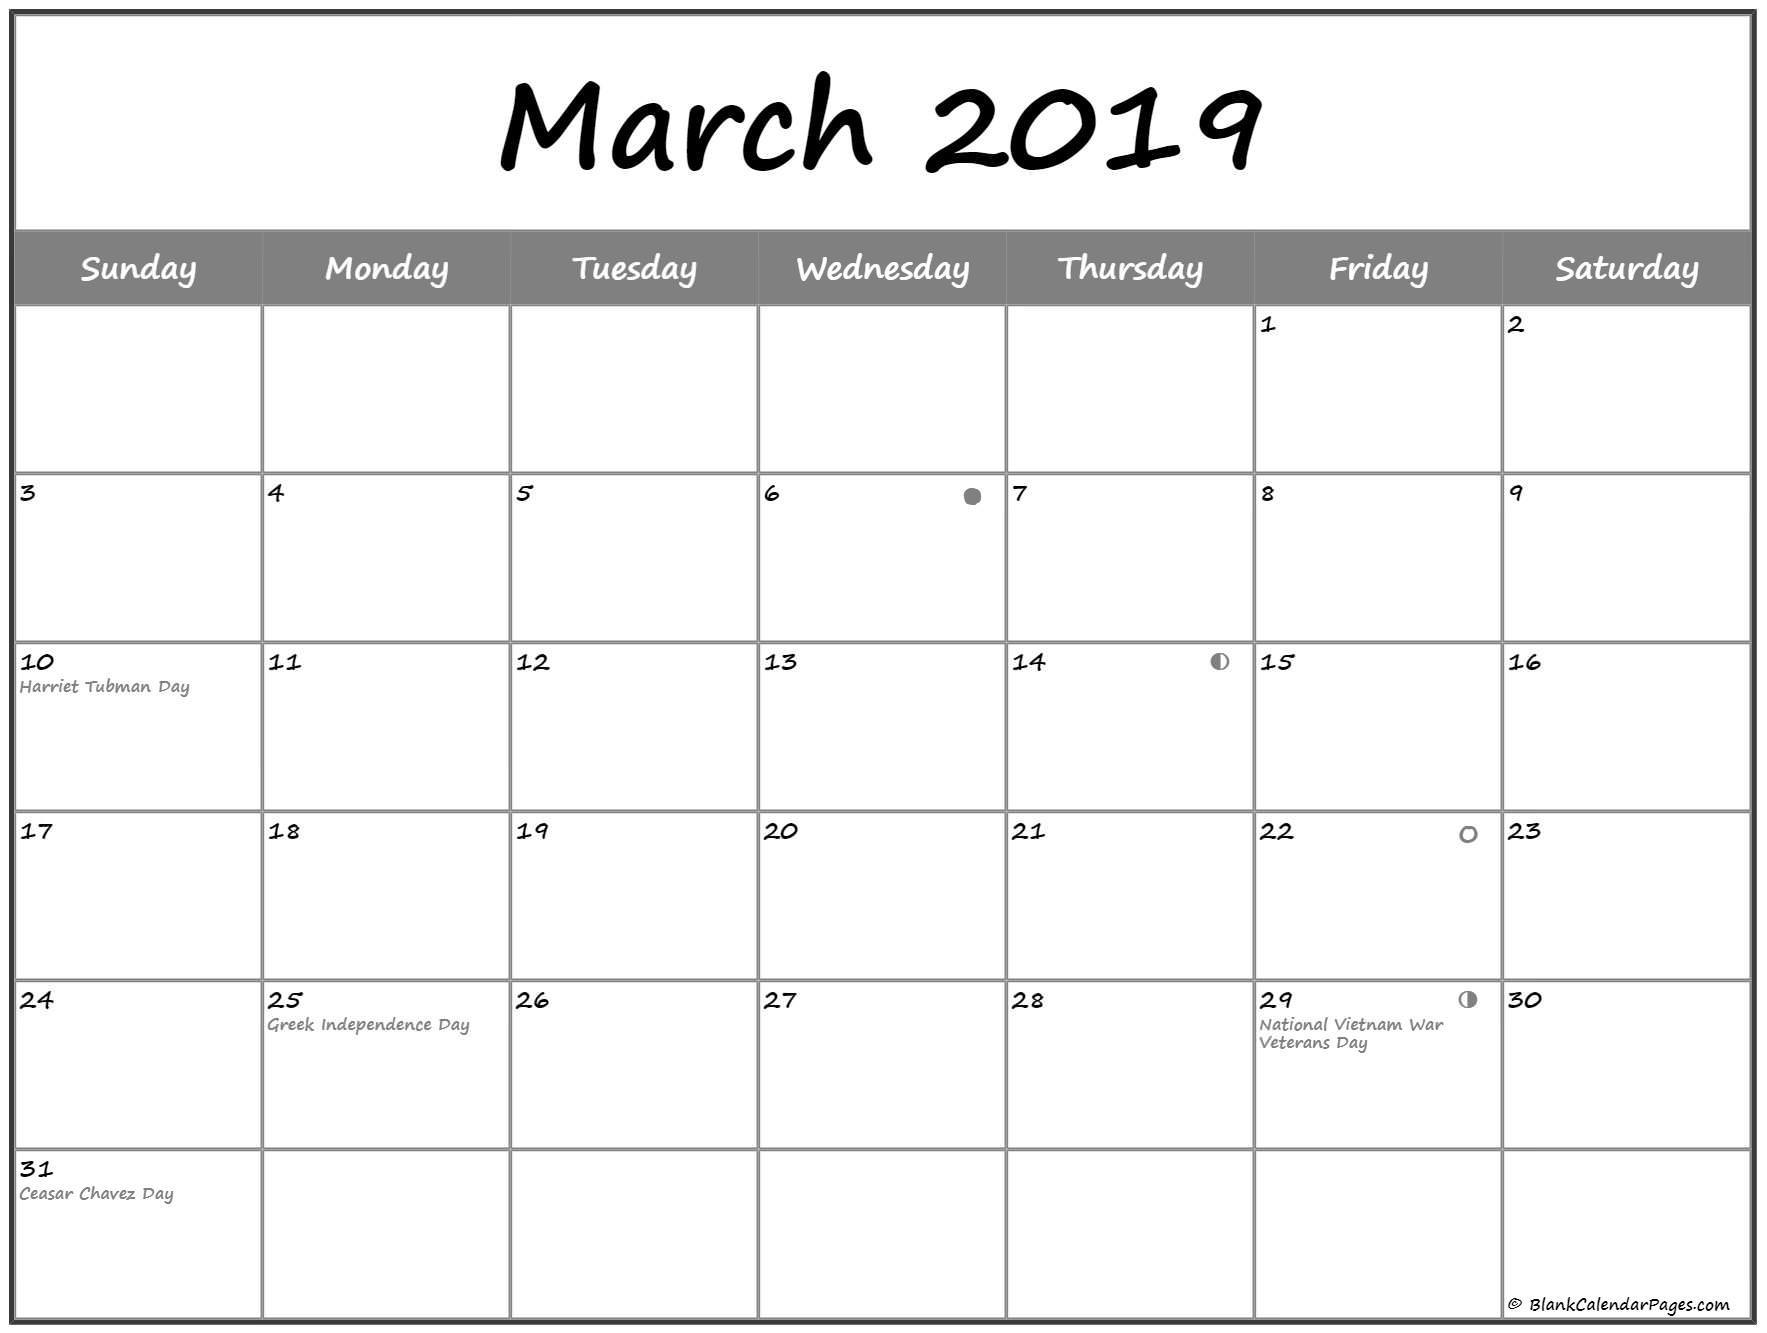 march 2019 lunar calendar moon phase calendar calendar template